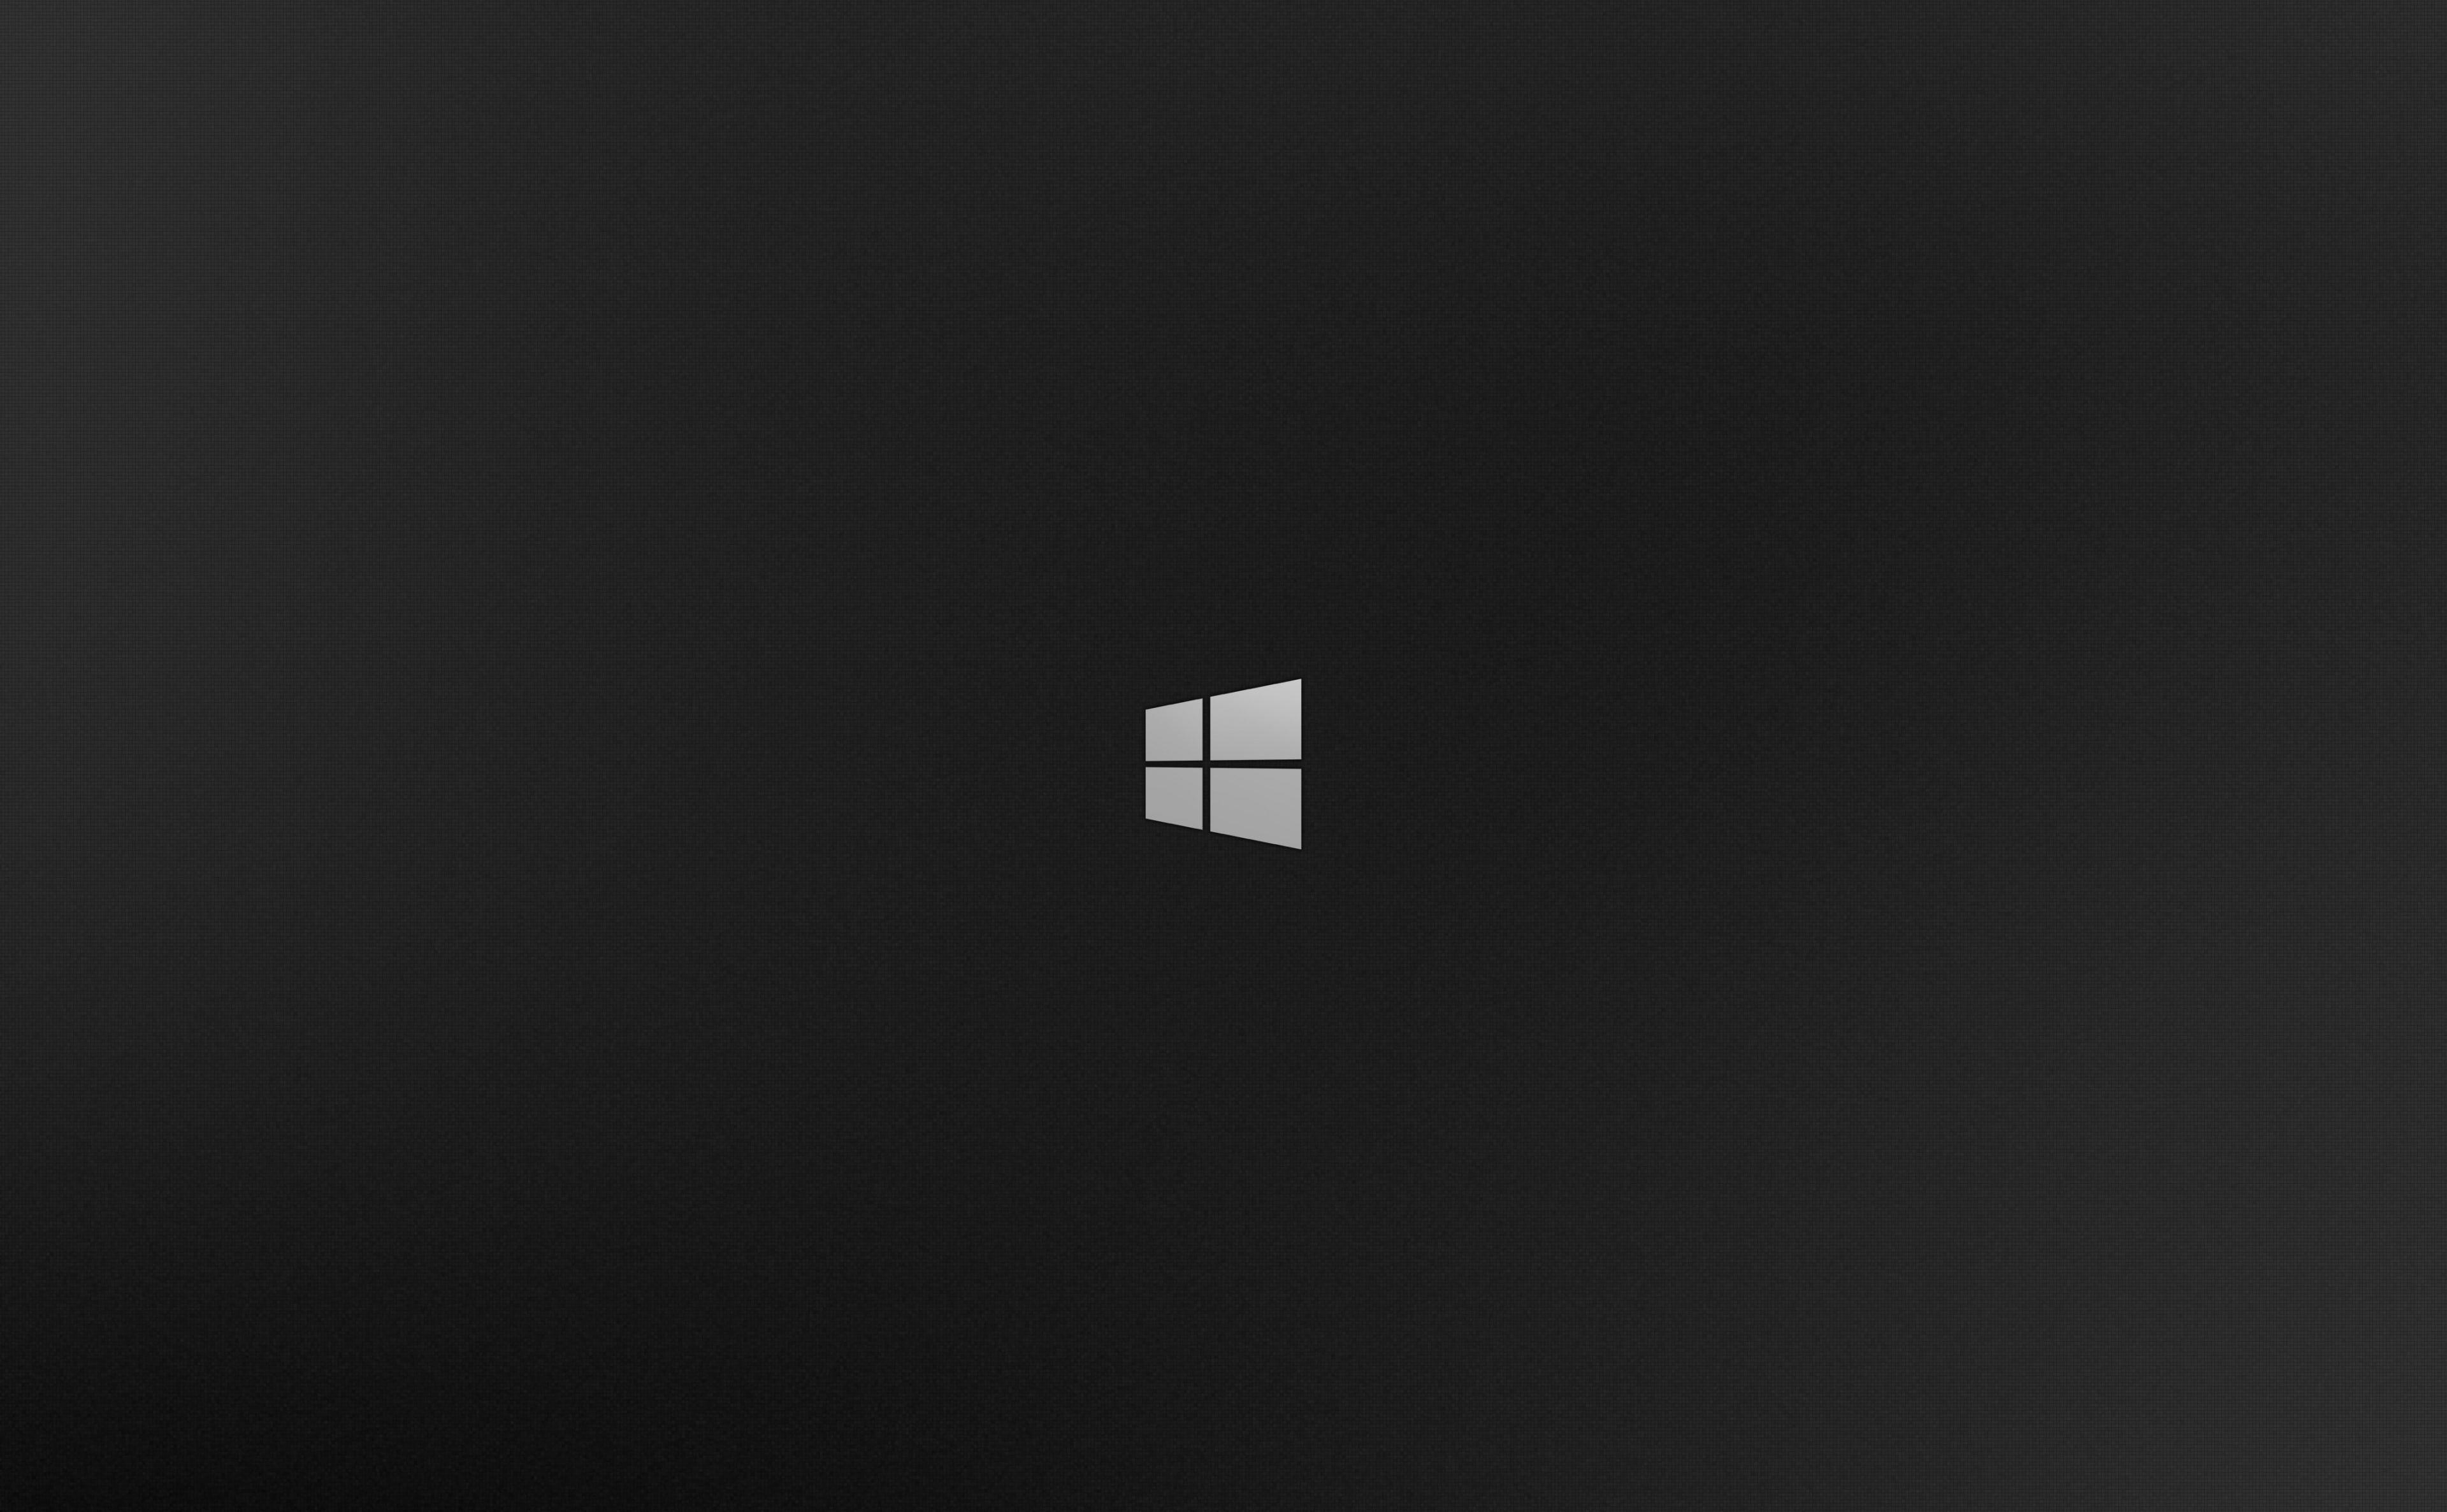 Pin On Beautiful Desktop Wallpapers Lockscreens Full Hd